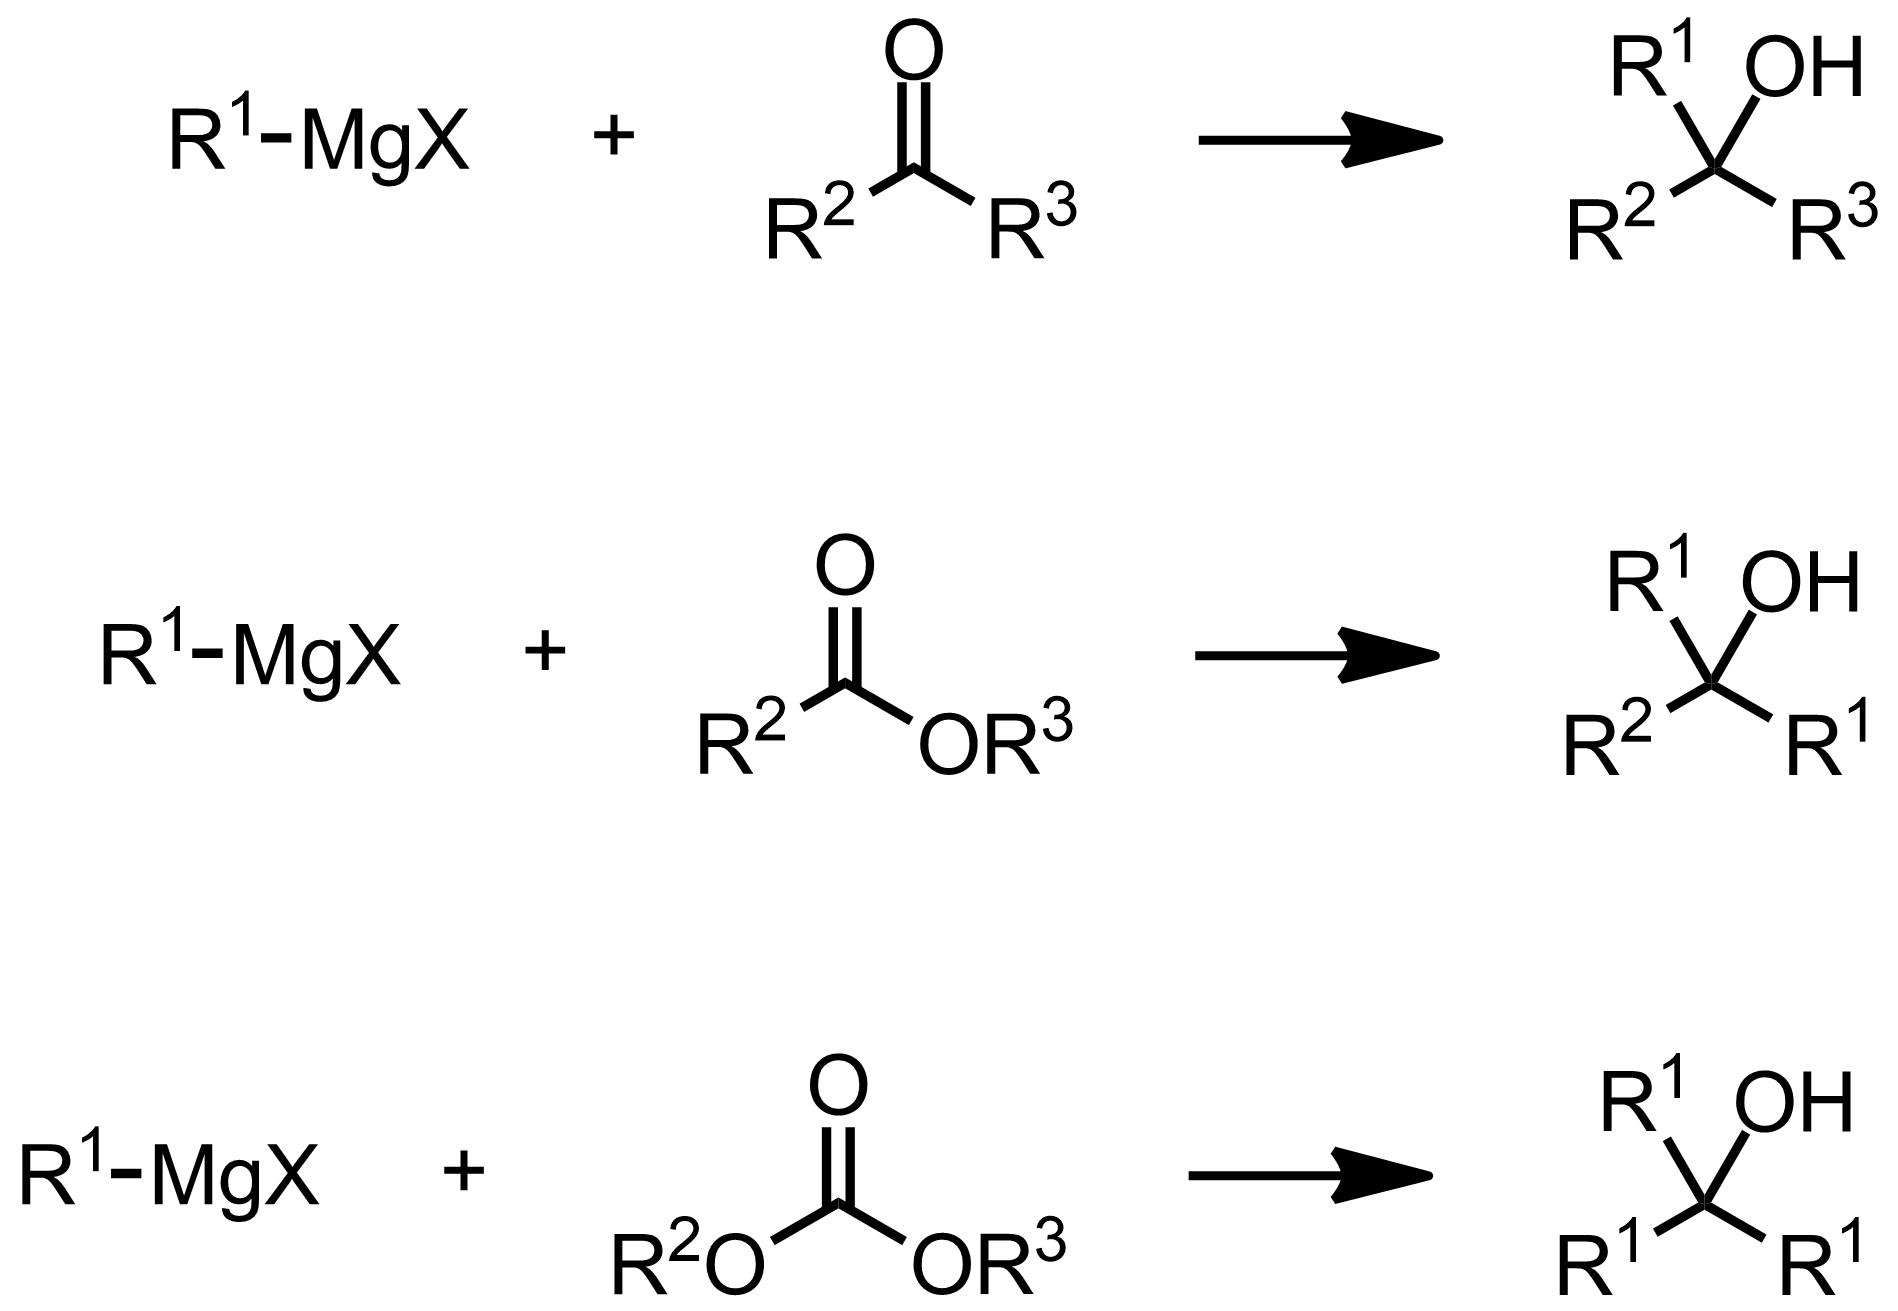 Schematic representation of the Grignard Reaction.